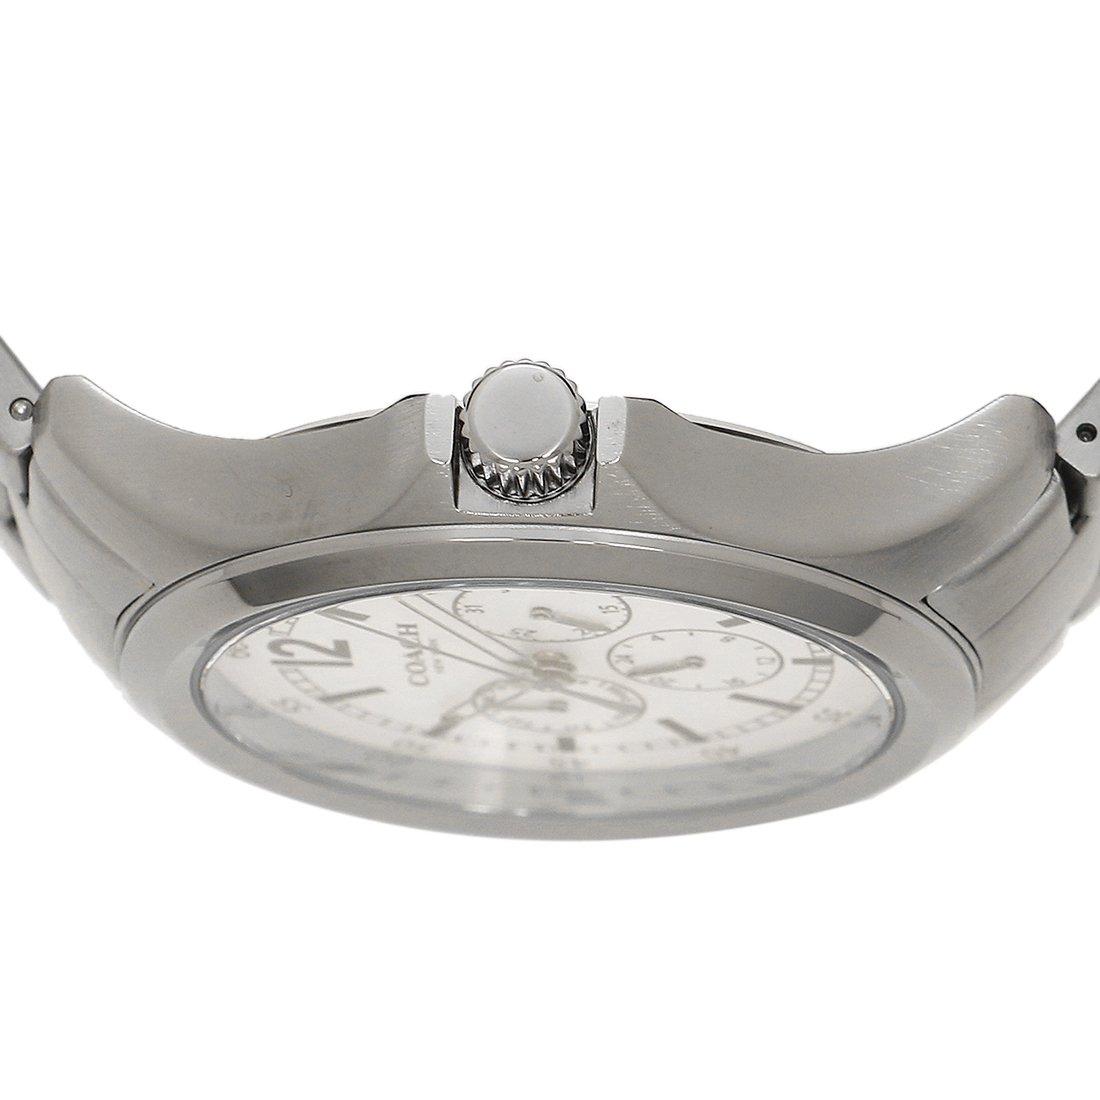 ea05f0318c93 Amazon | [コーチ] 腕時計 メンズ アウトレット COACH W5013 GM/WT ガンメタル ホワイト [並行輸入品] | 並行輸入品・逆 輸入品・中古品(メンズ) | 腕時計 通販